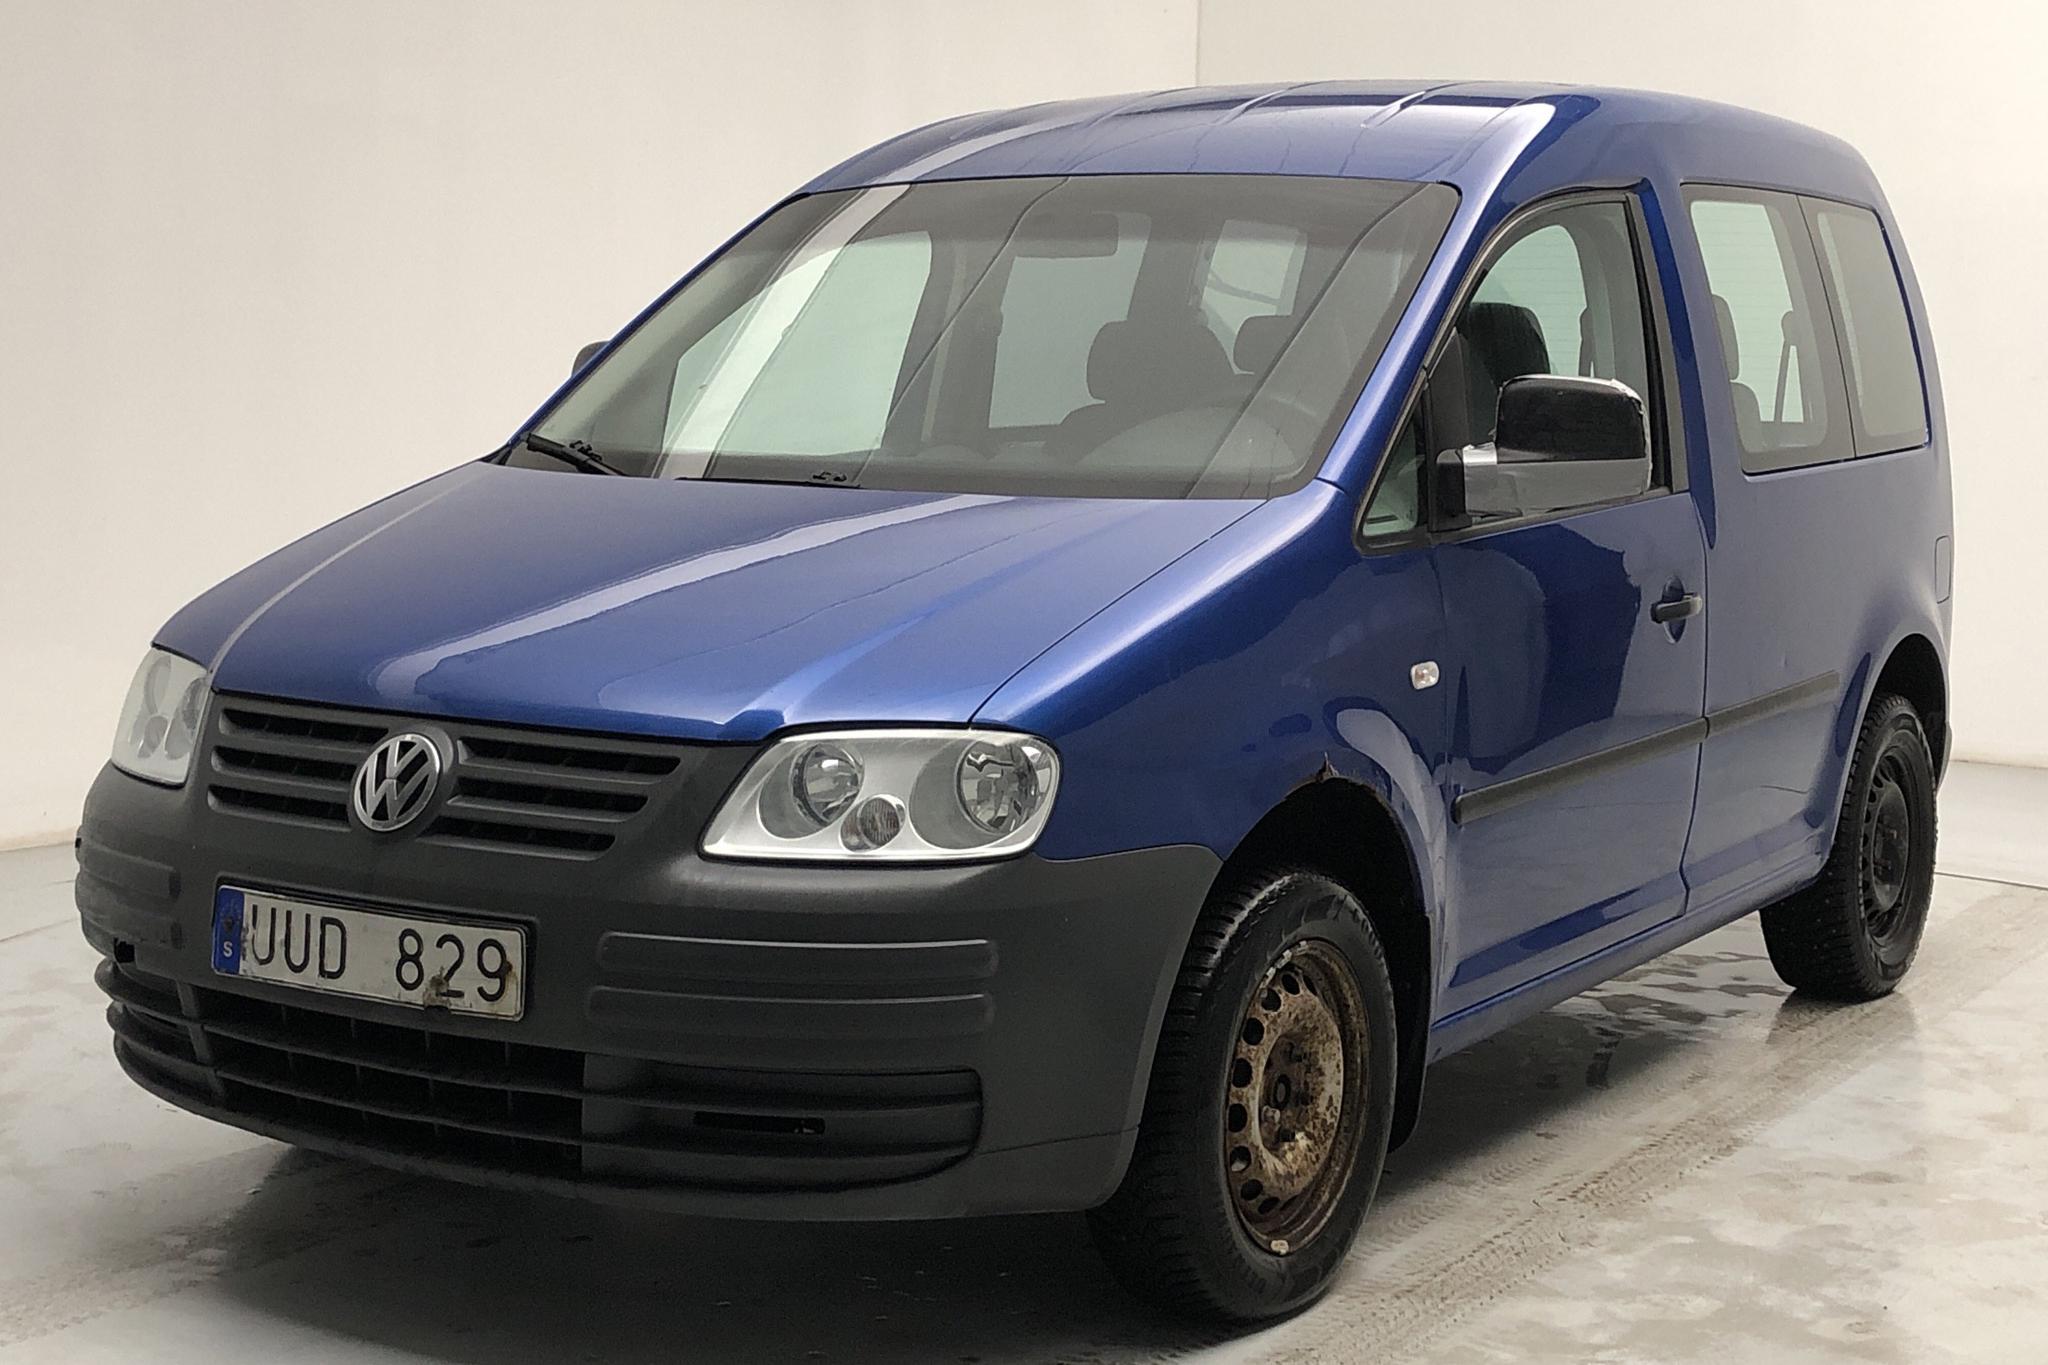 VW Caddy Life 1.4 (75hk) - 30 145 mil - Manuell - blå - 2004